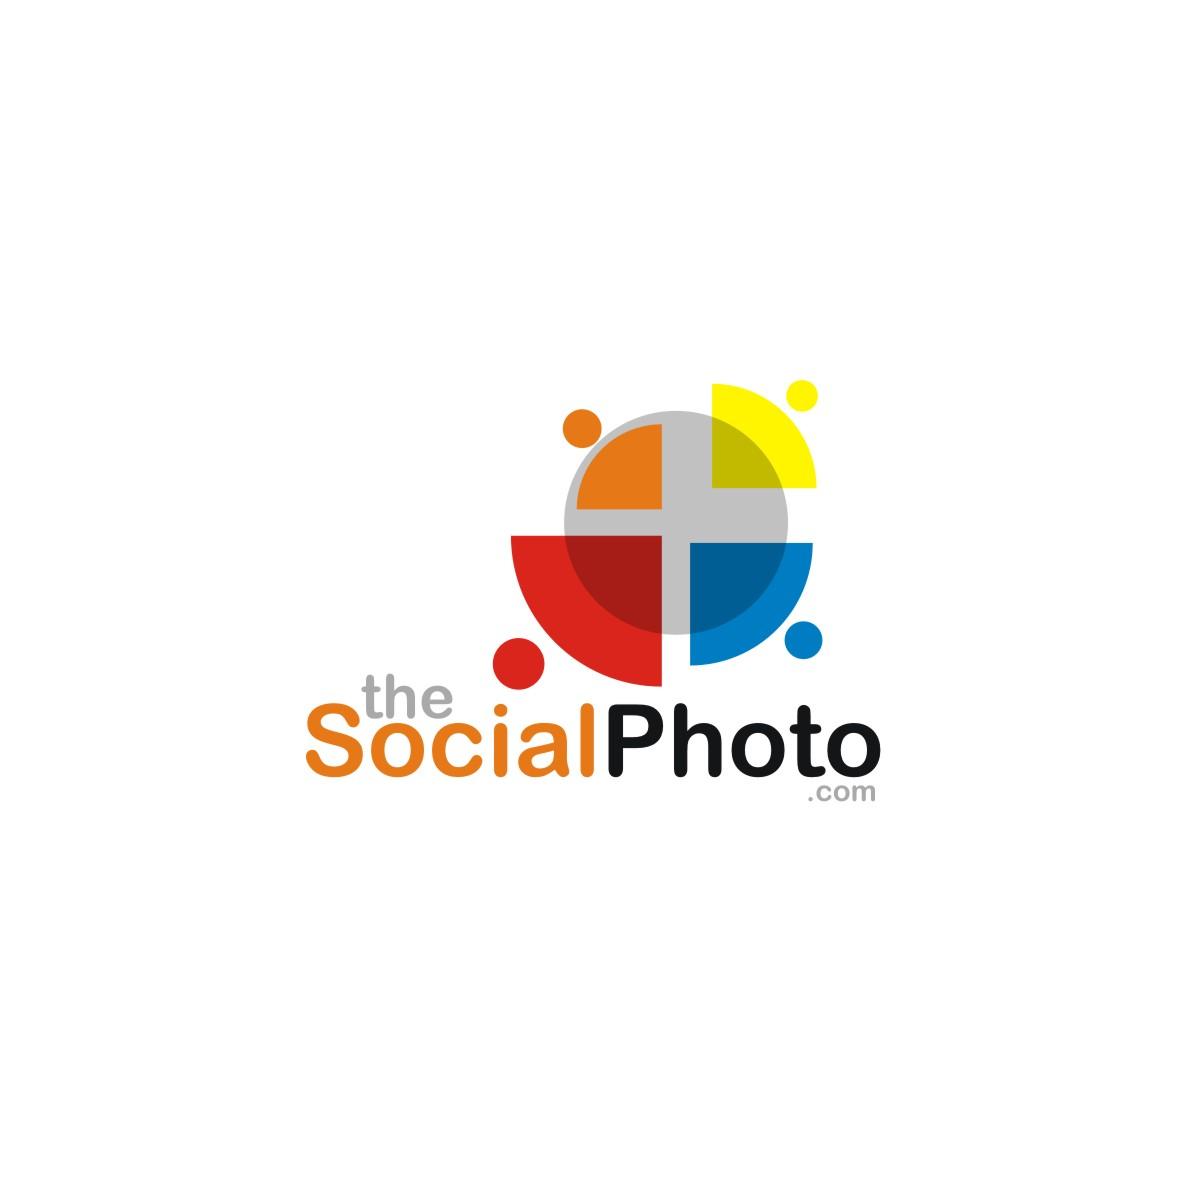 Free Logo Maker  1 Logo Creator  Make a Logo Online